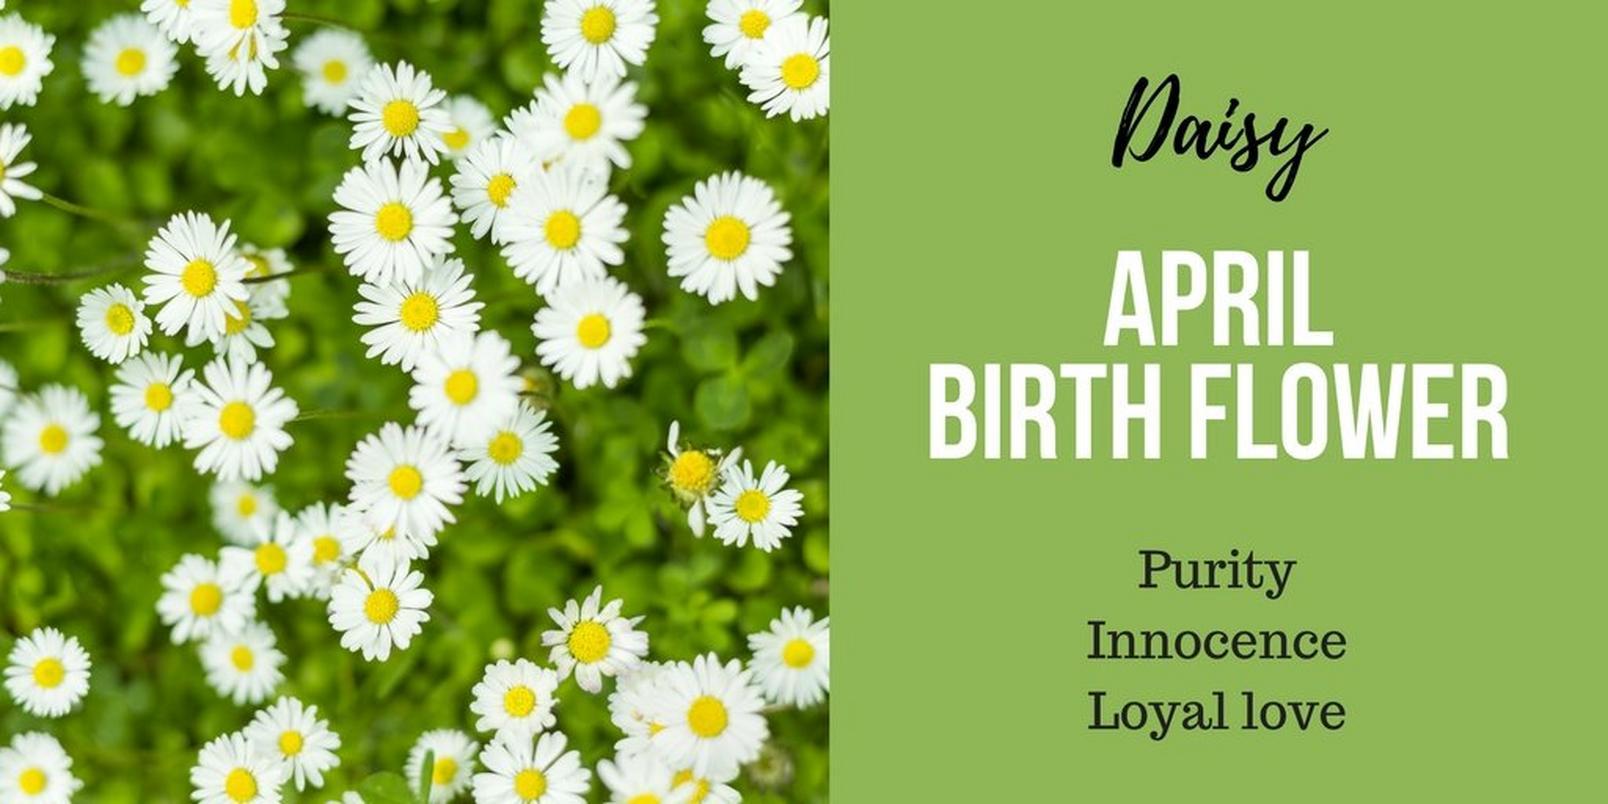 April-birth-flower